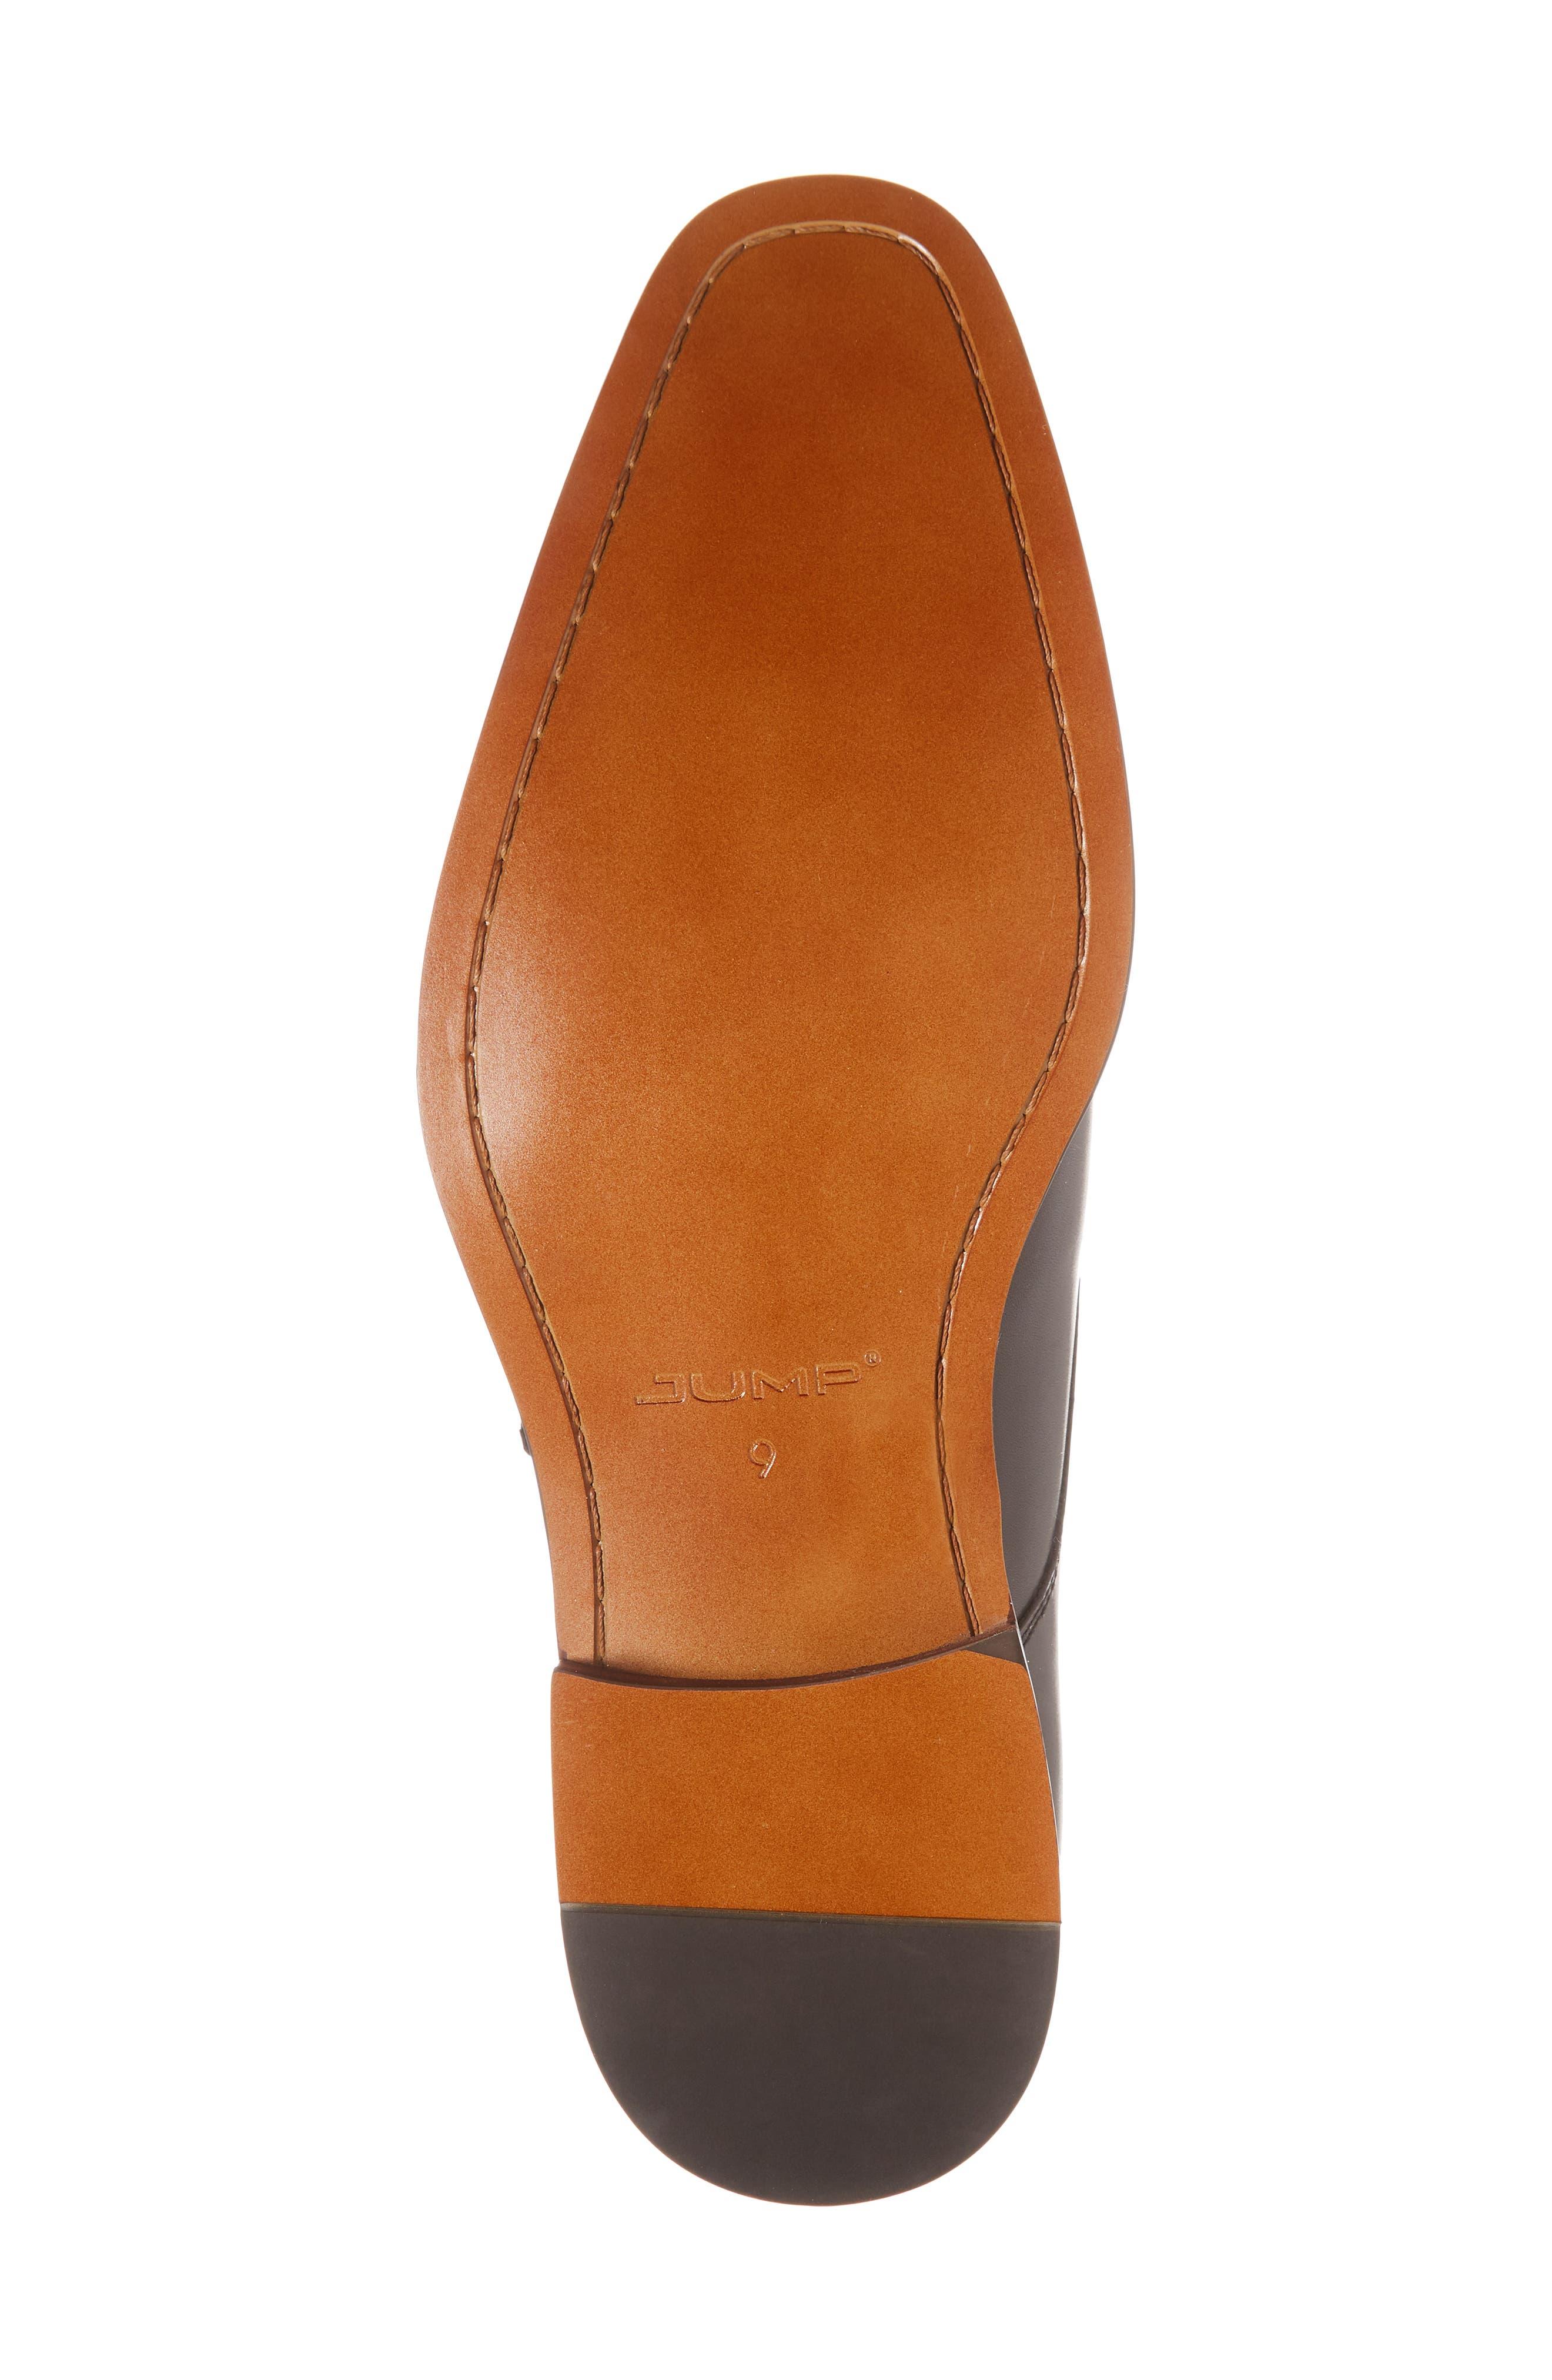 JUMP, Merlot Single Buckle Monk Shoe, Alternate thumbnail 6, color, 001